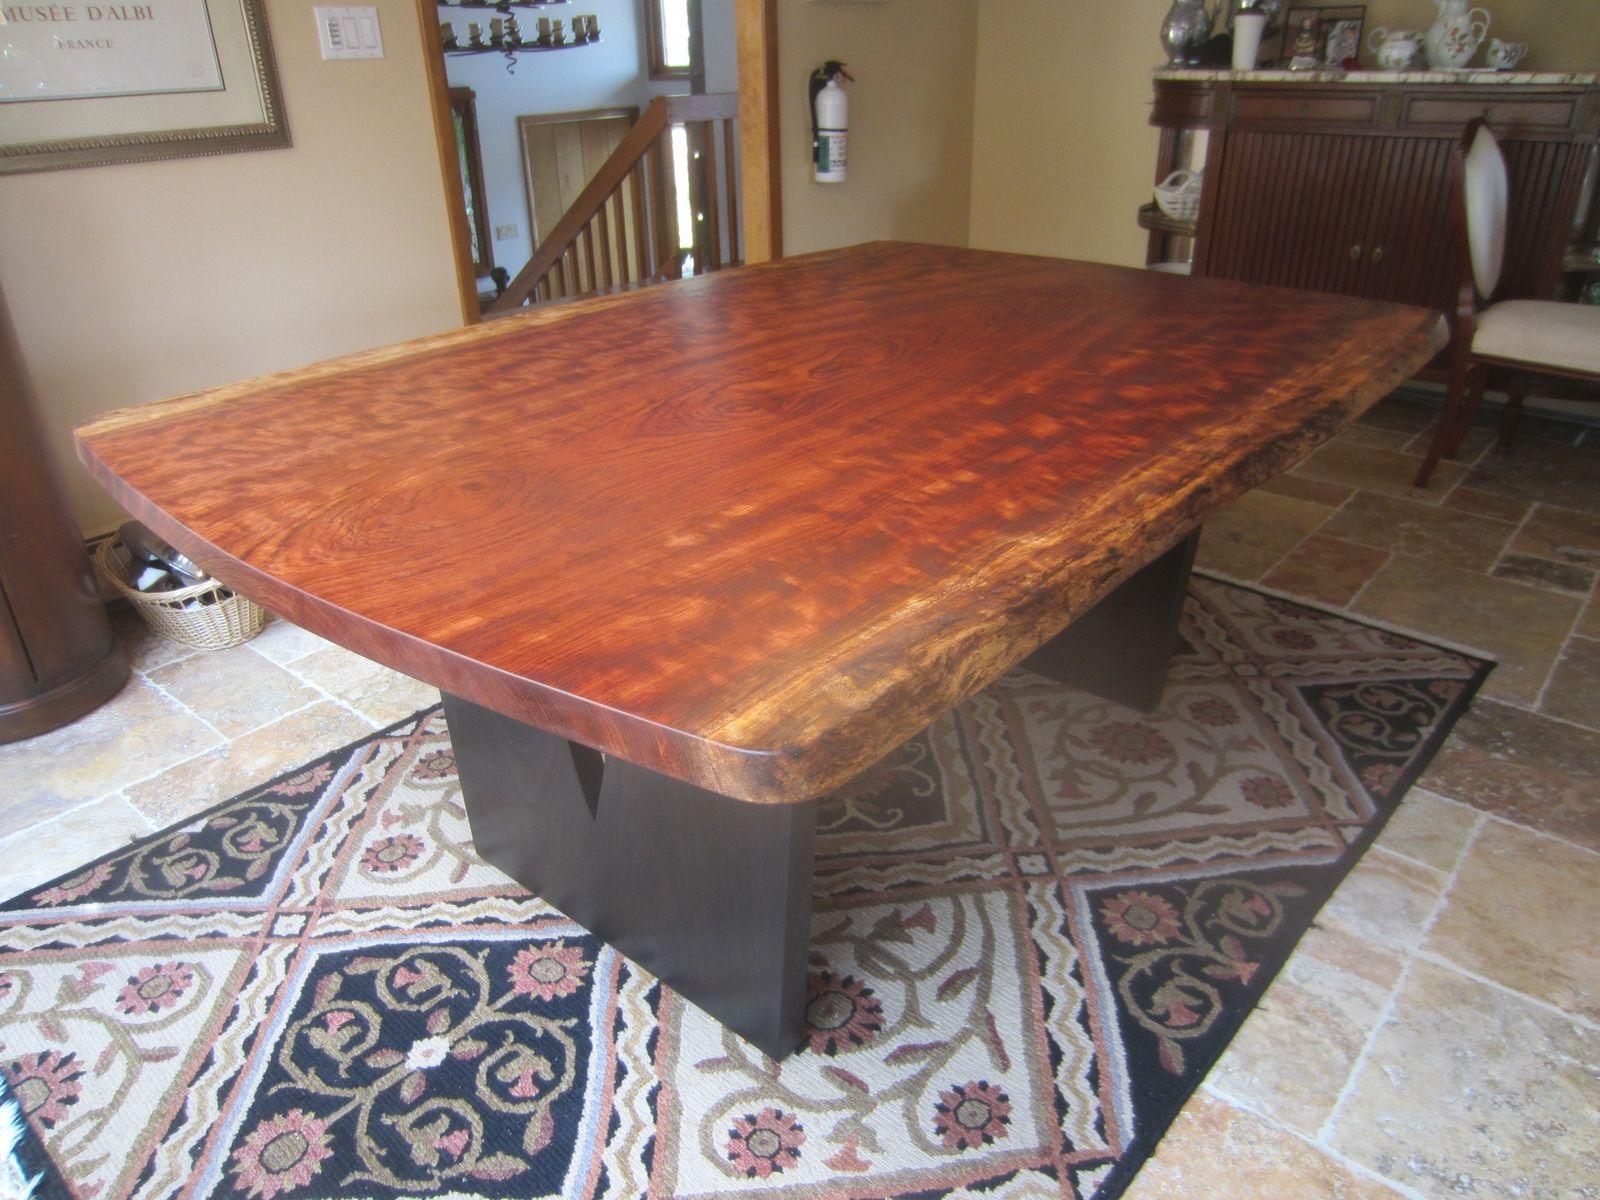 Handmade Live Edge Bubinga Slab Kitchen Table By Cabinetmaker Birdie Miller